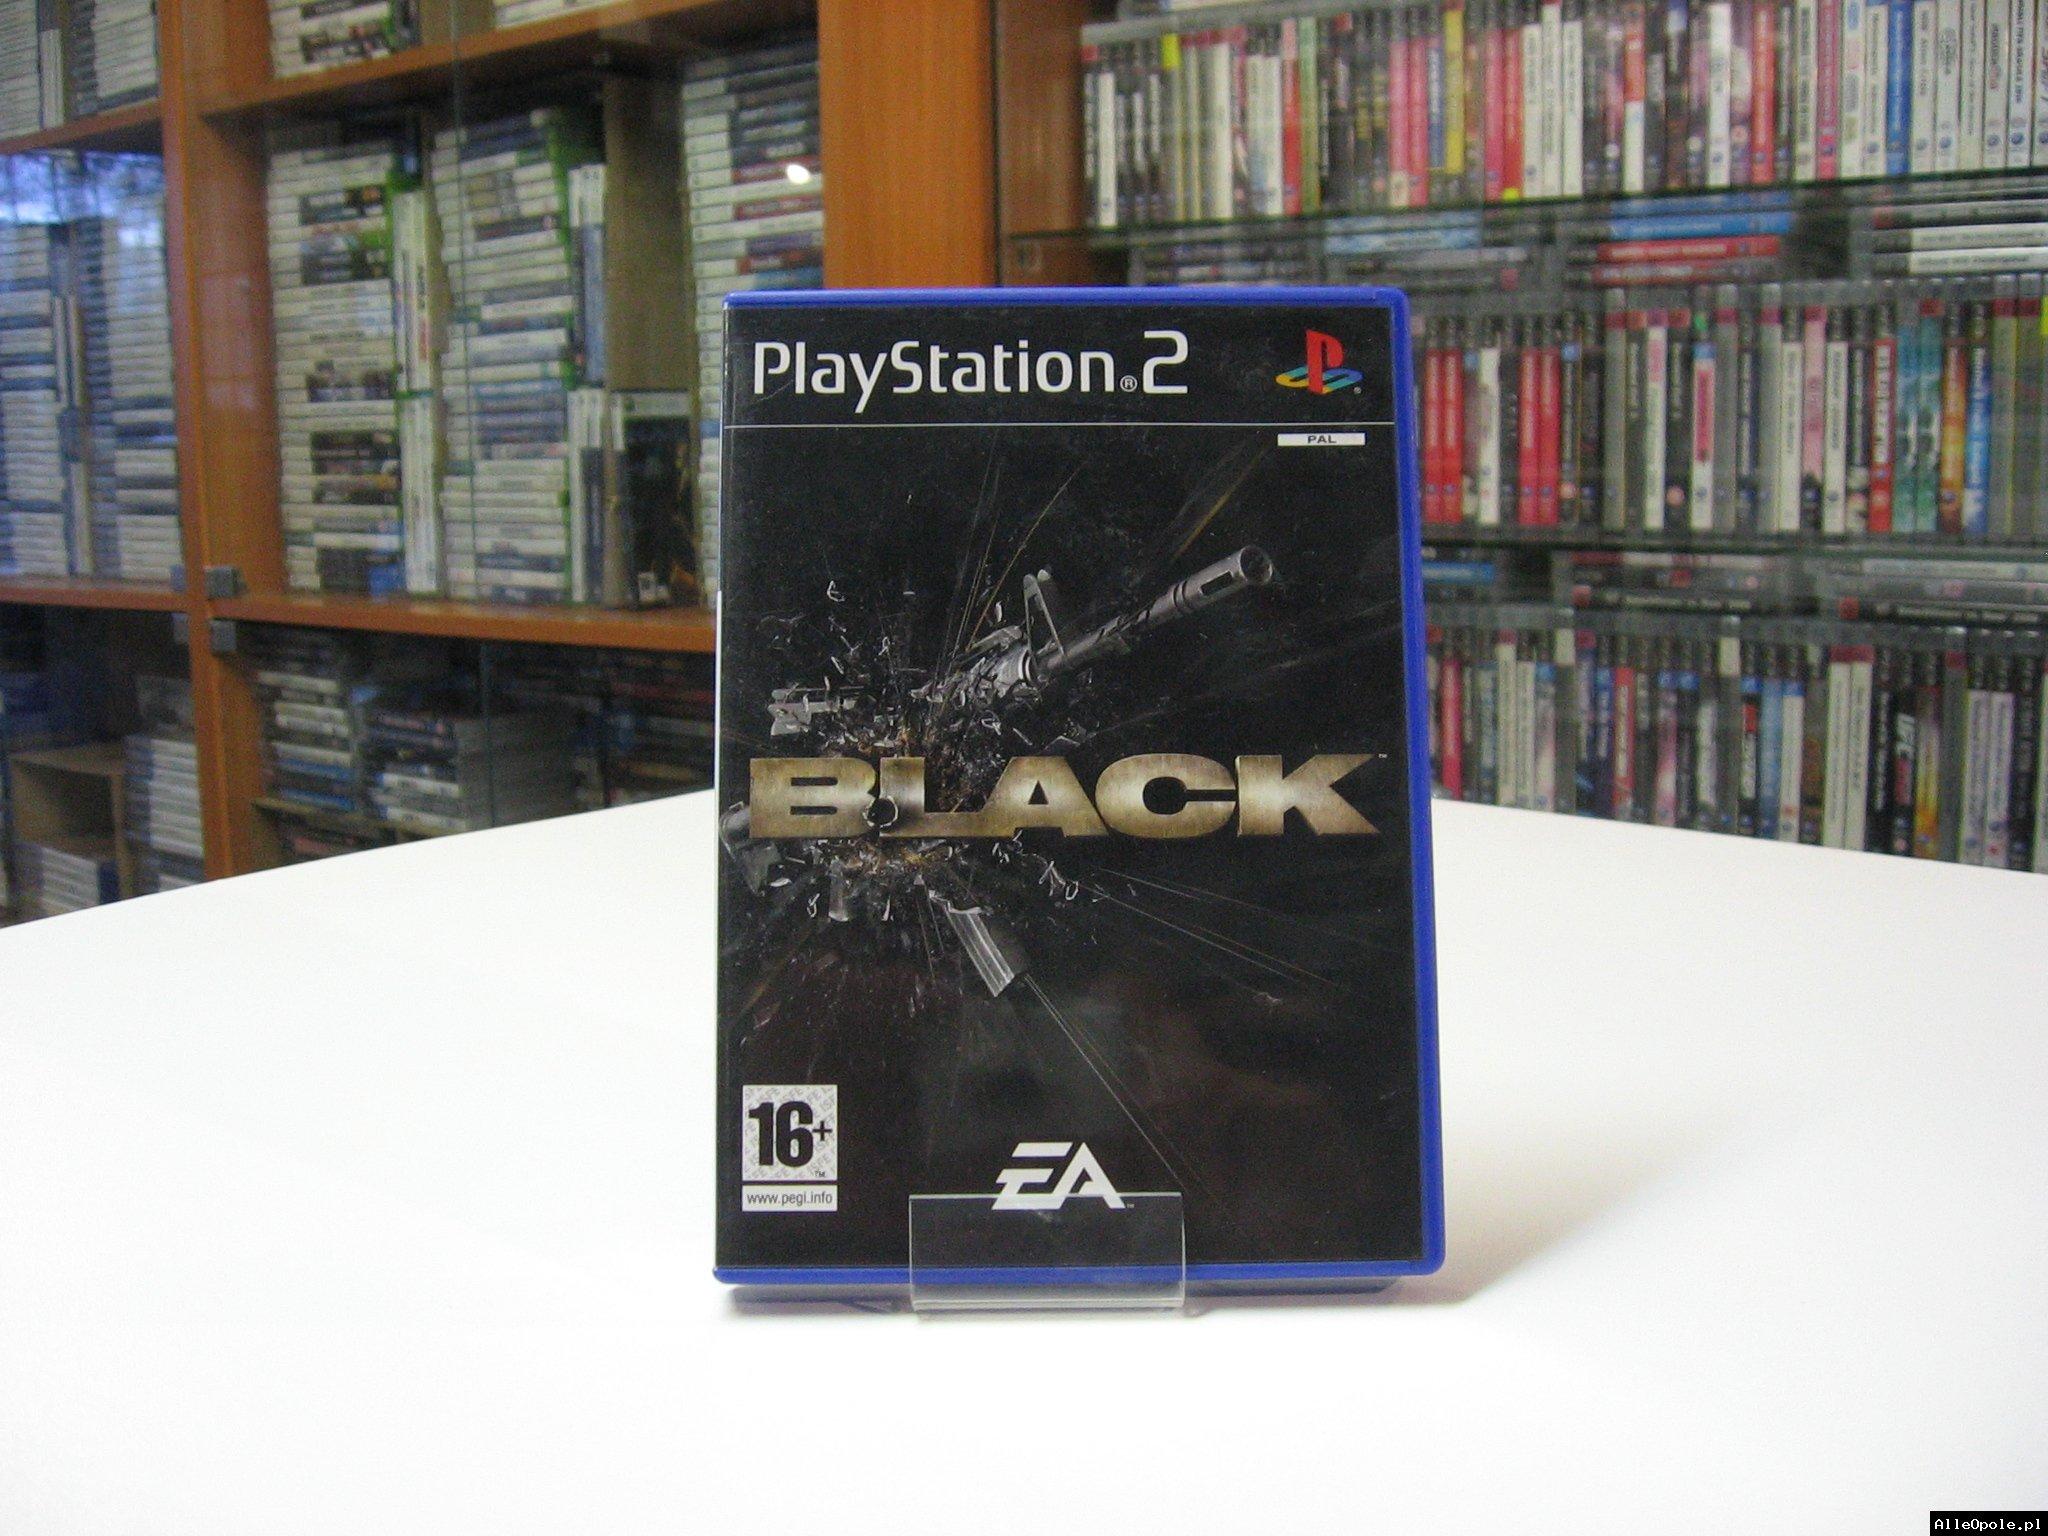 Black PL - GRA Ps2 - Opole 0592